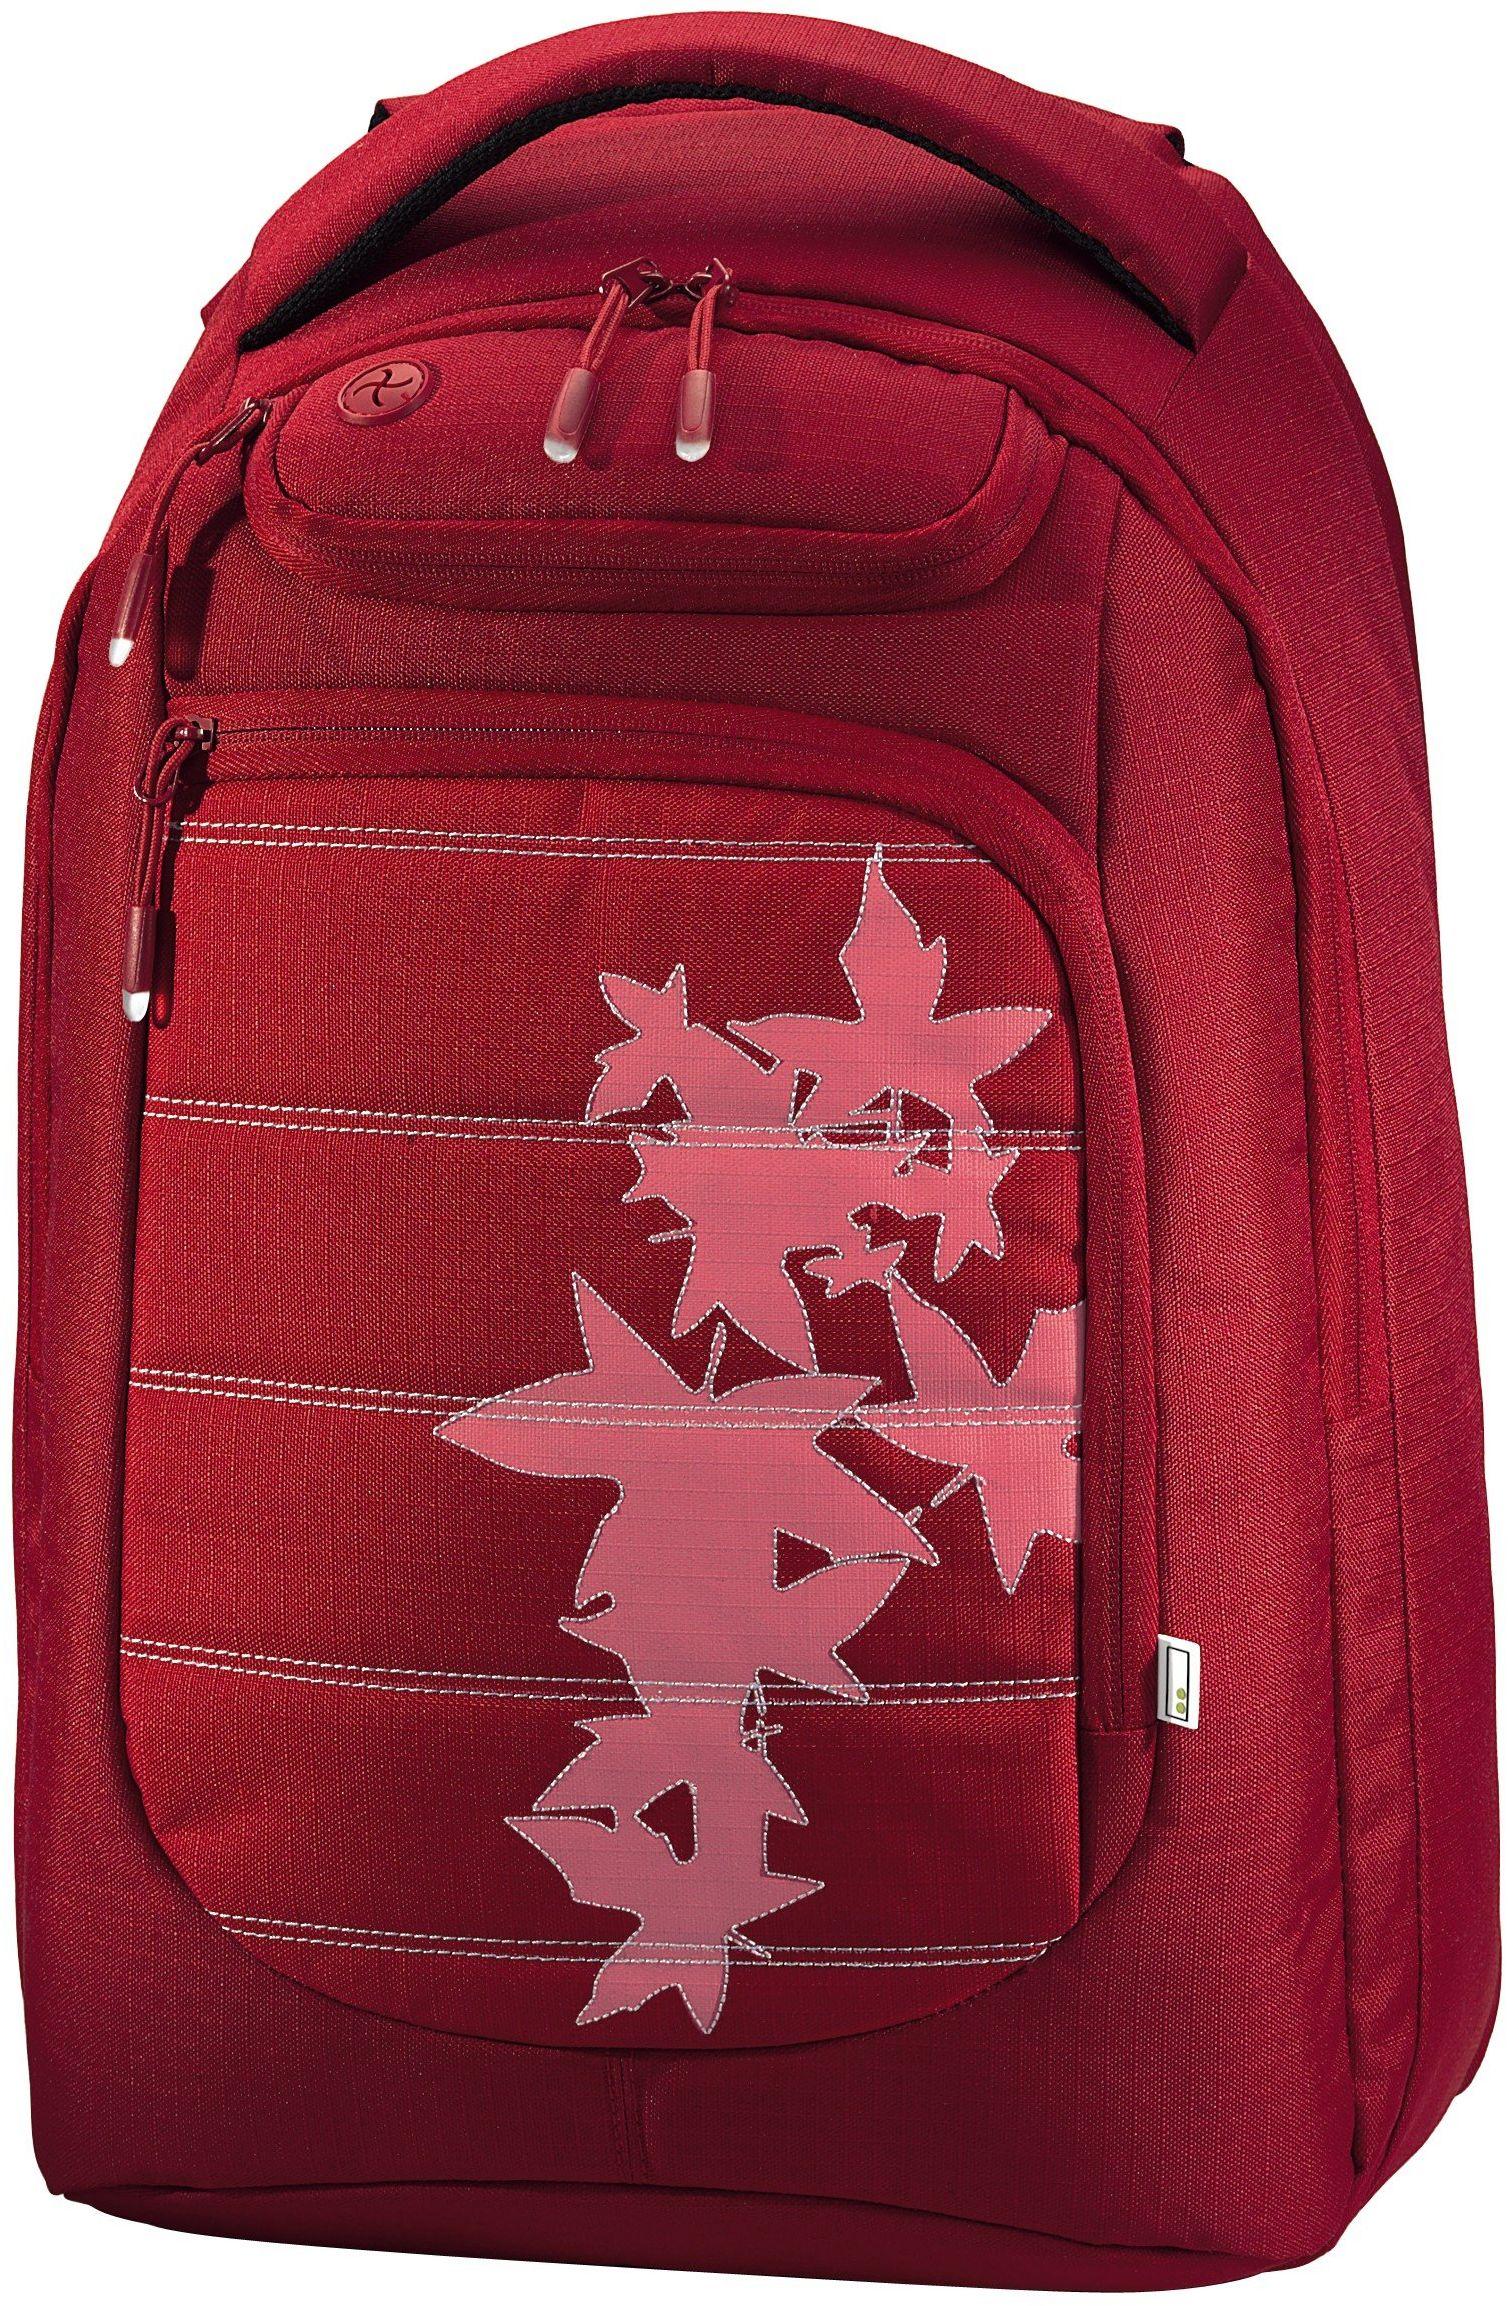 "aha: plecak na notebooka 39,12 cm (15,4 cala) ""Maple"""